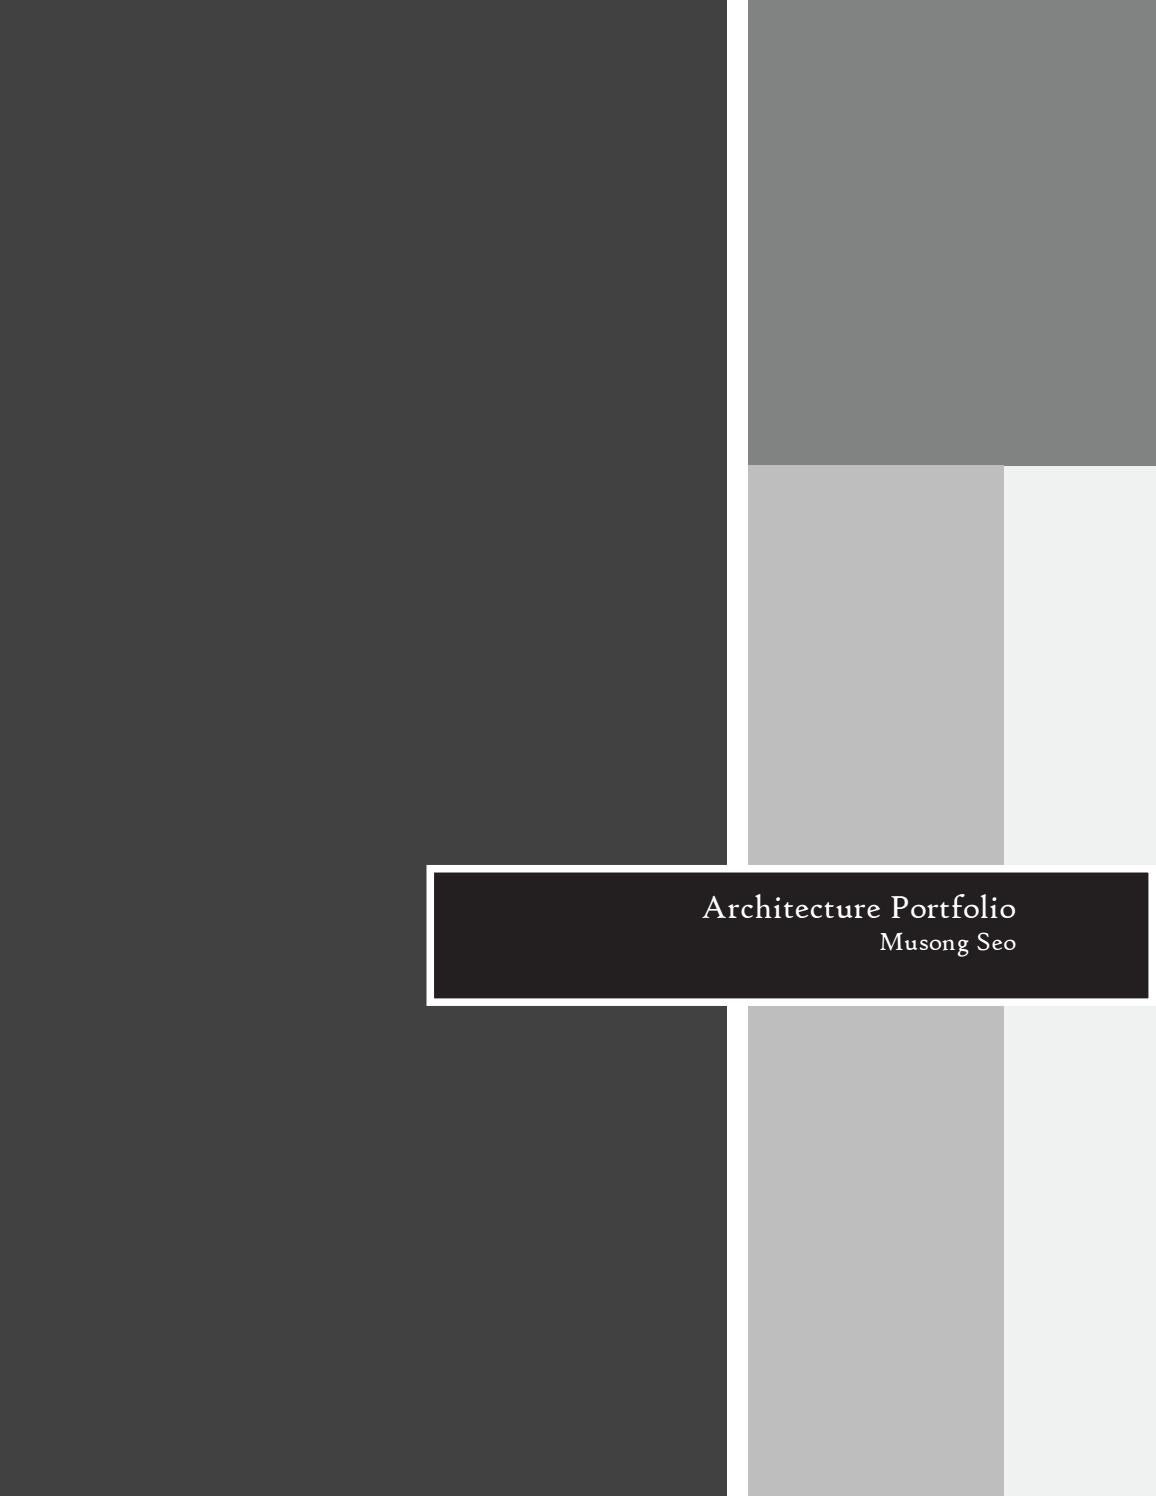 Musong Seo - Architecture Portfolio by Musong Seo - issuu